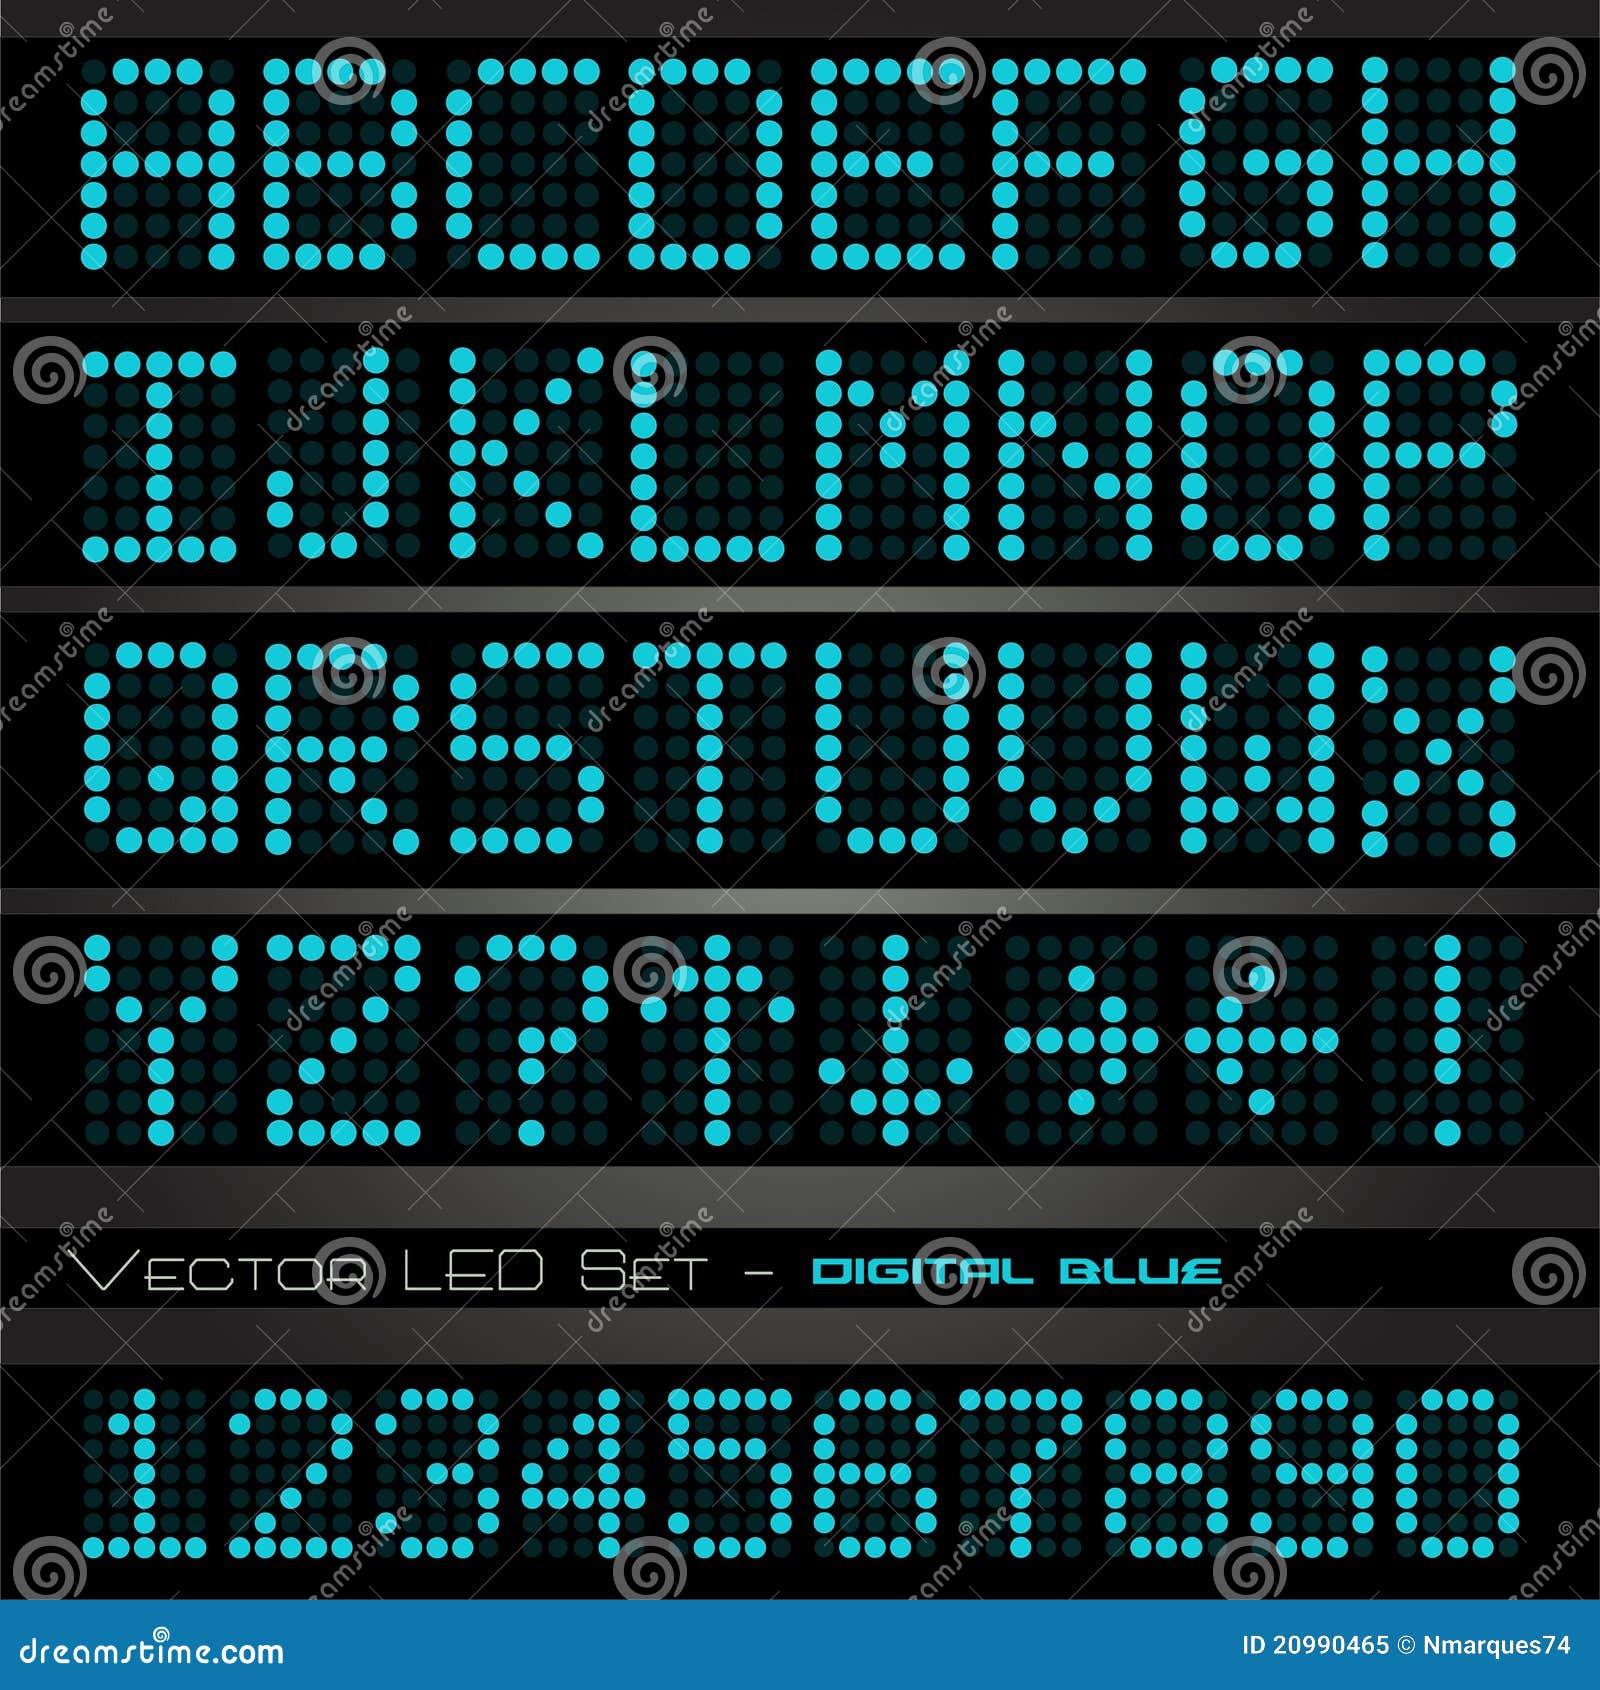 Digital-bold free font download.